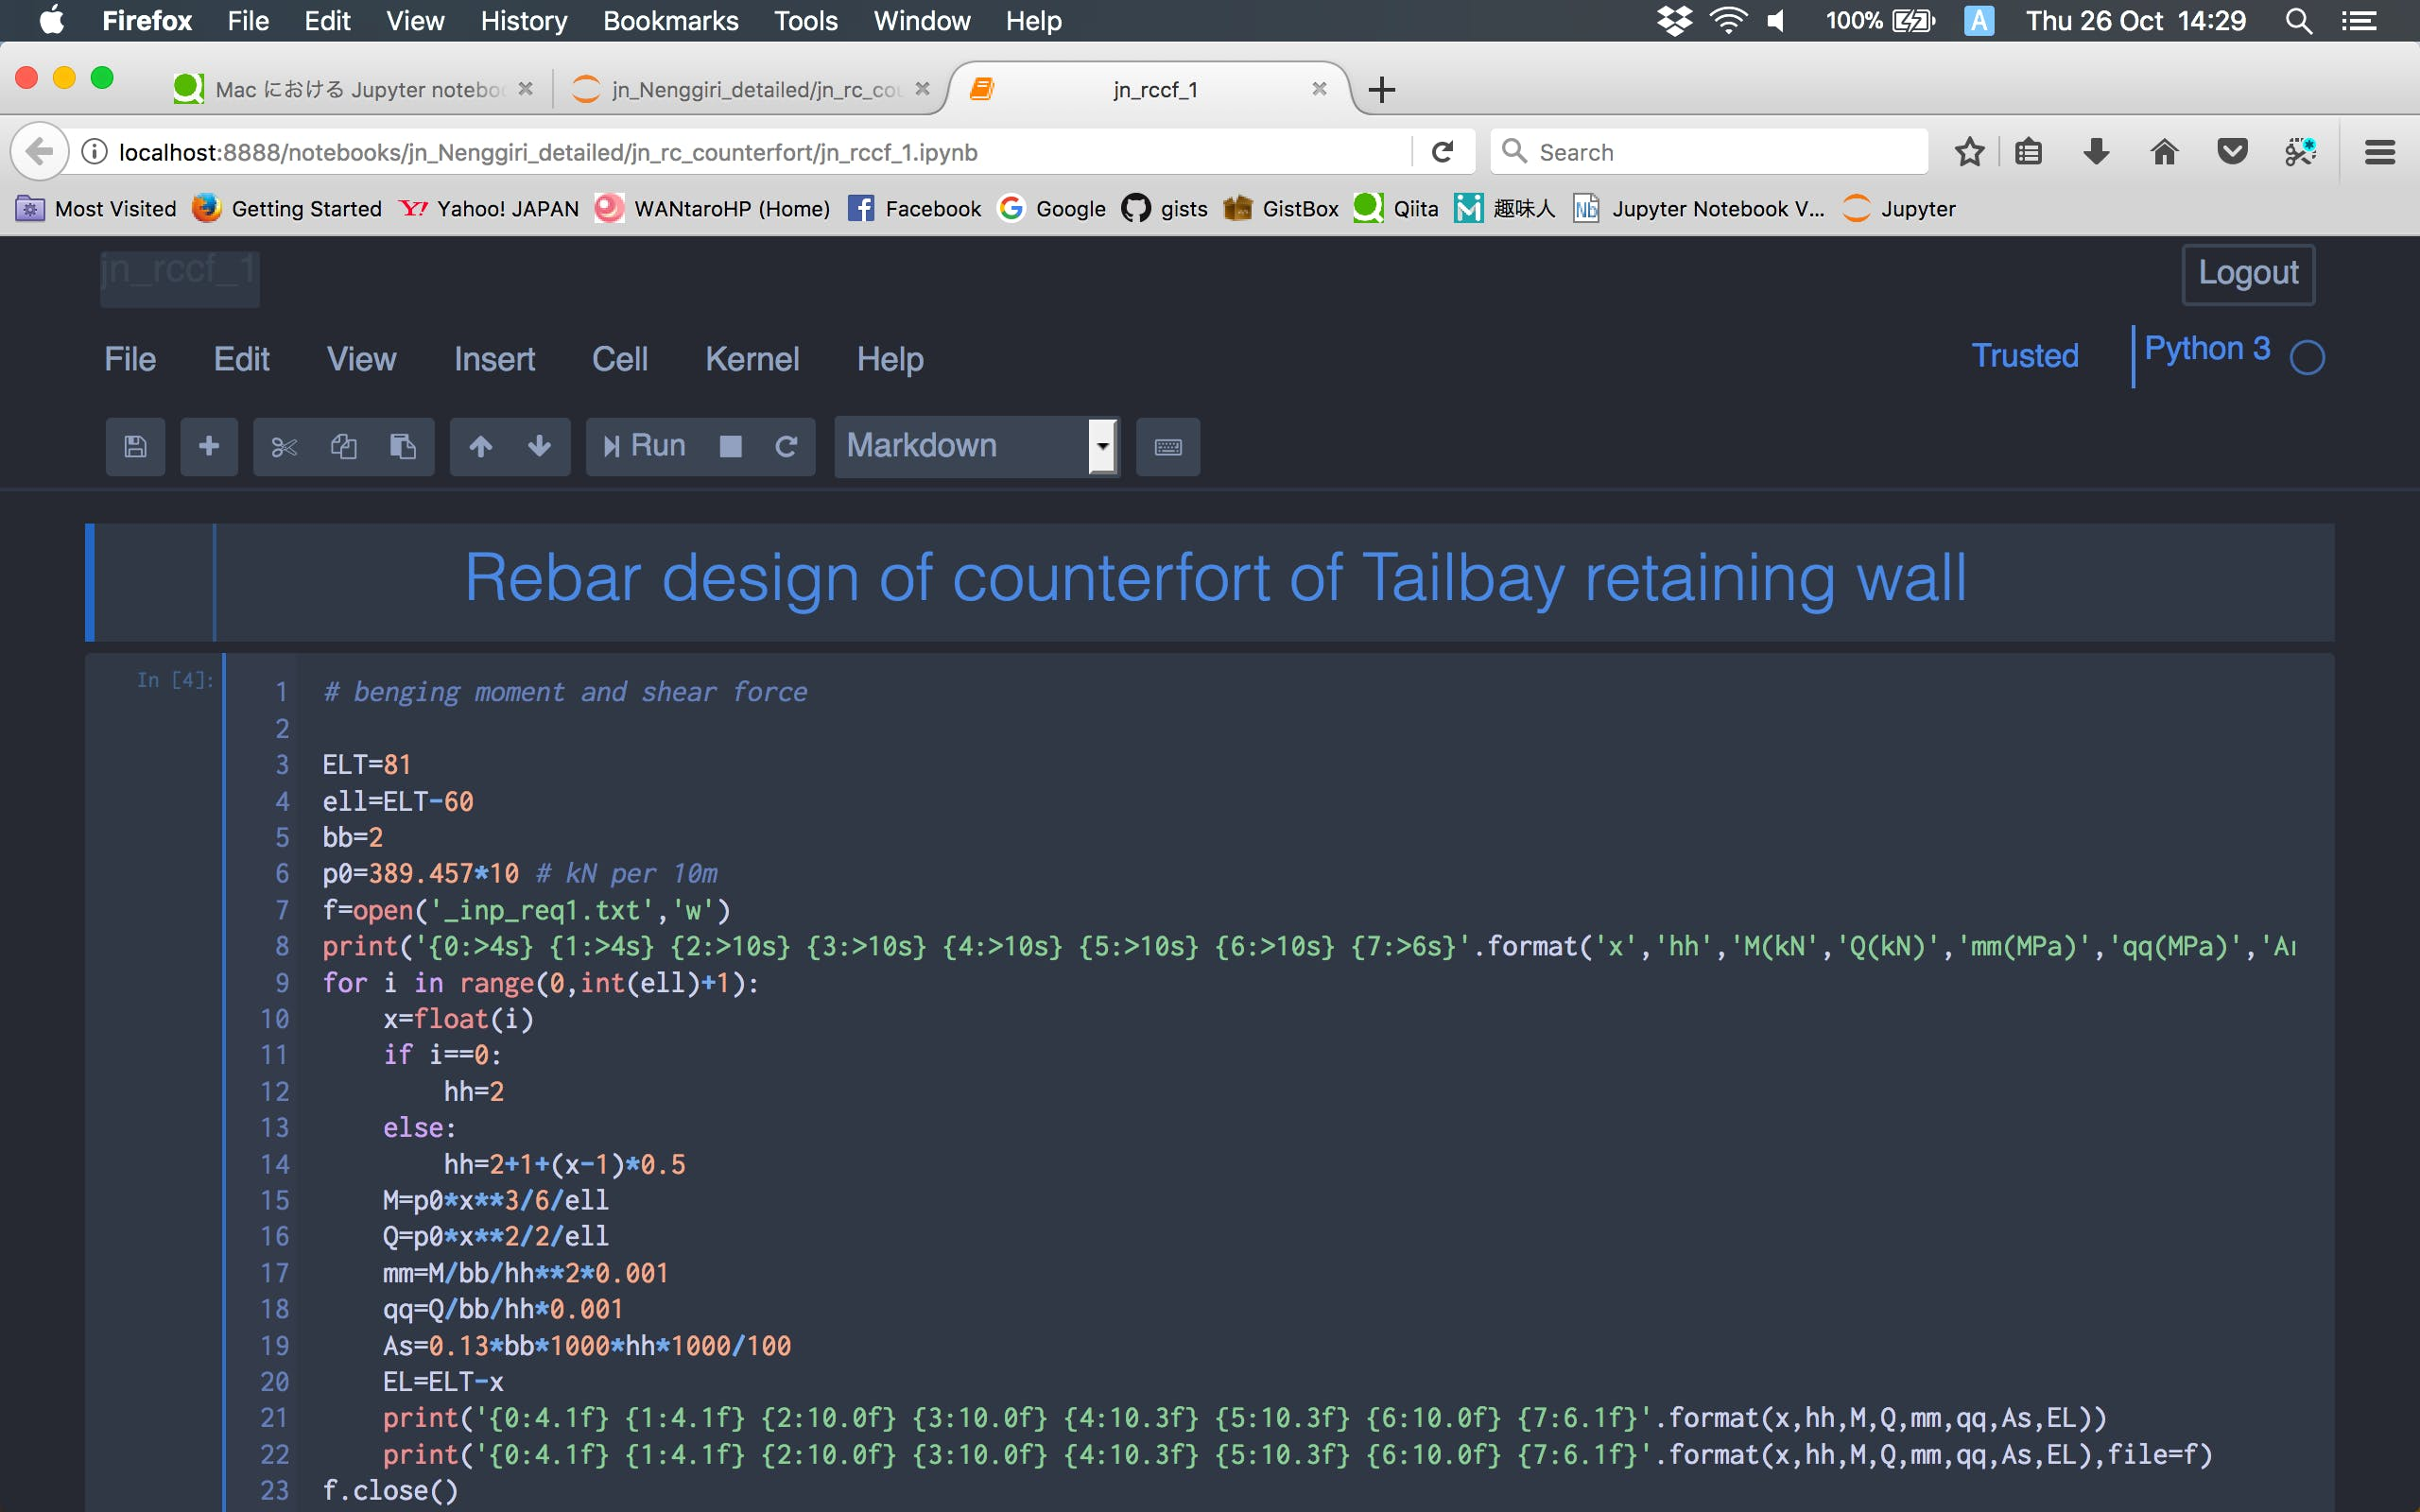 Screenshot 2017-10-26 14.29.54.png